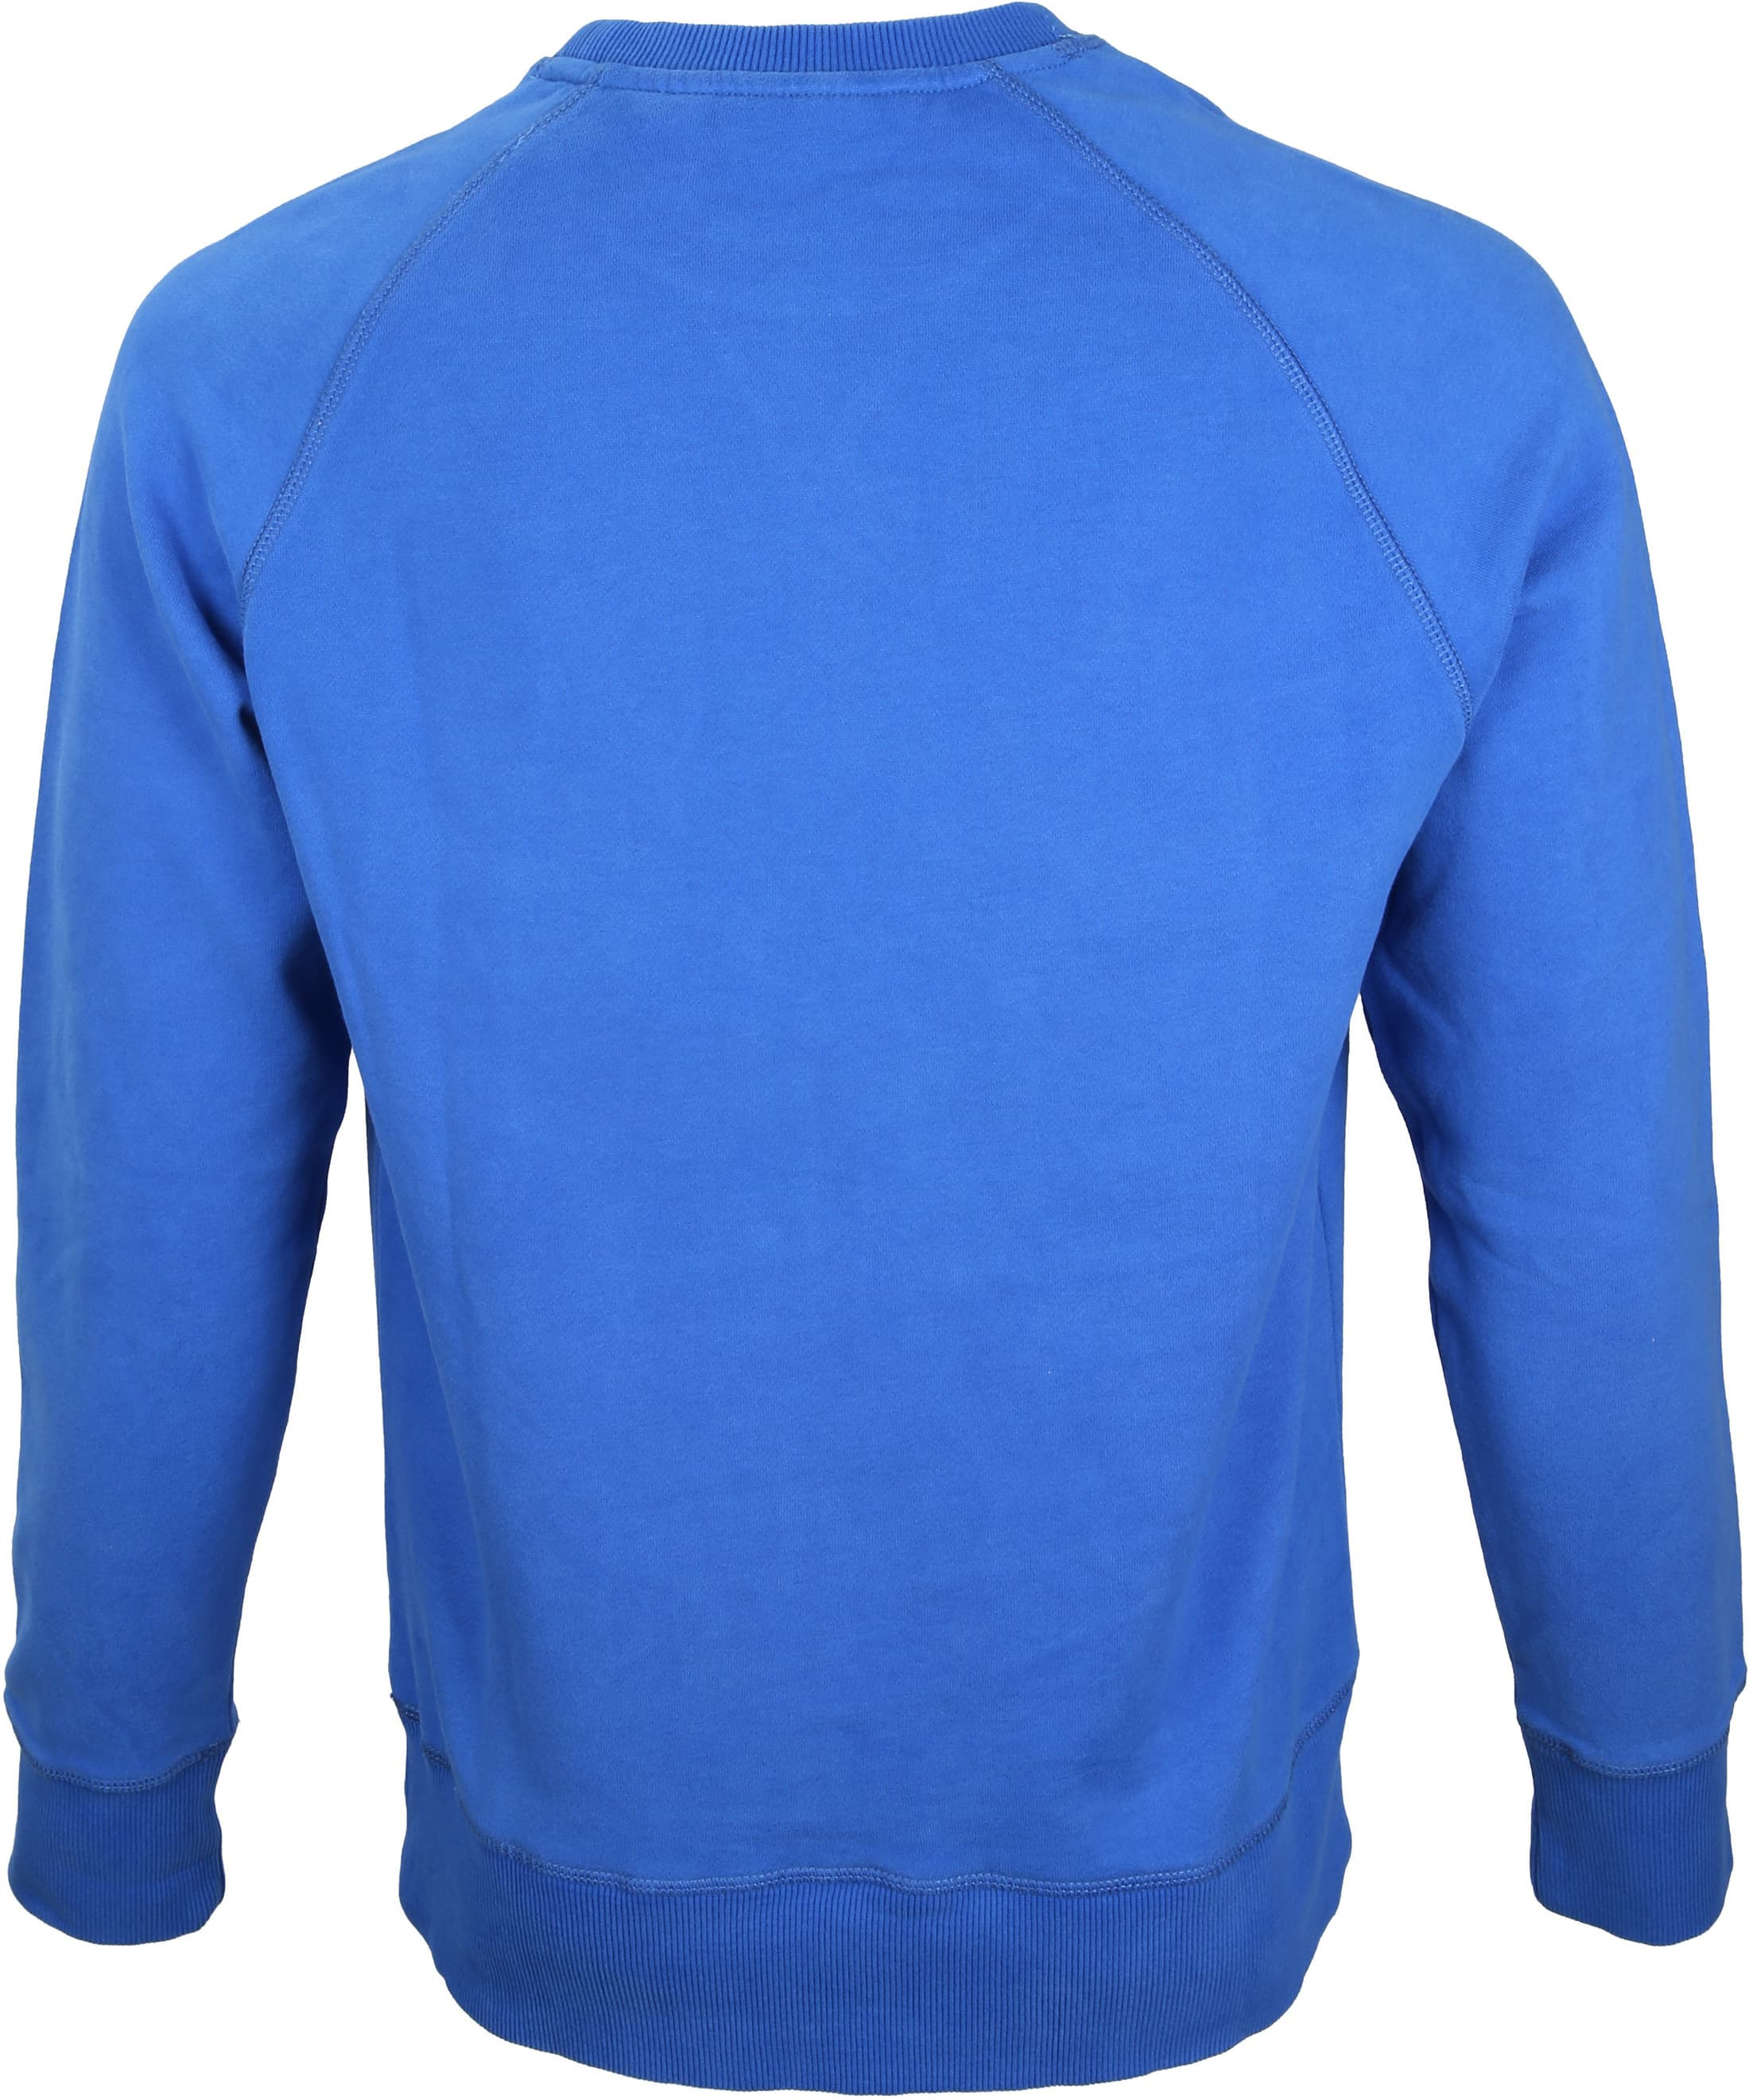 Timberland Sweater Mid Blauw foto 2